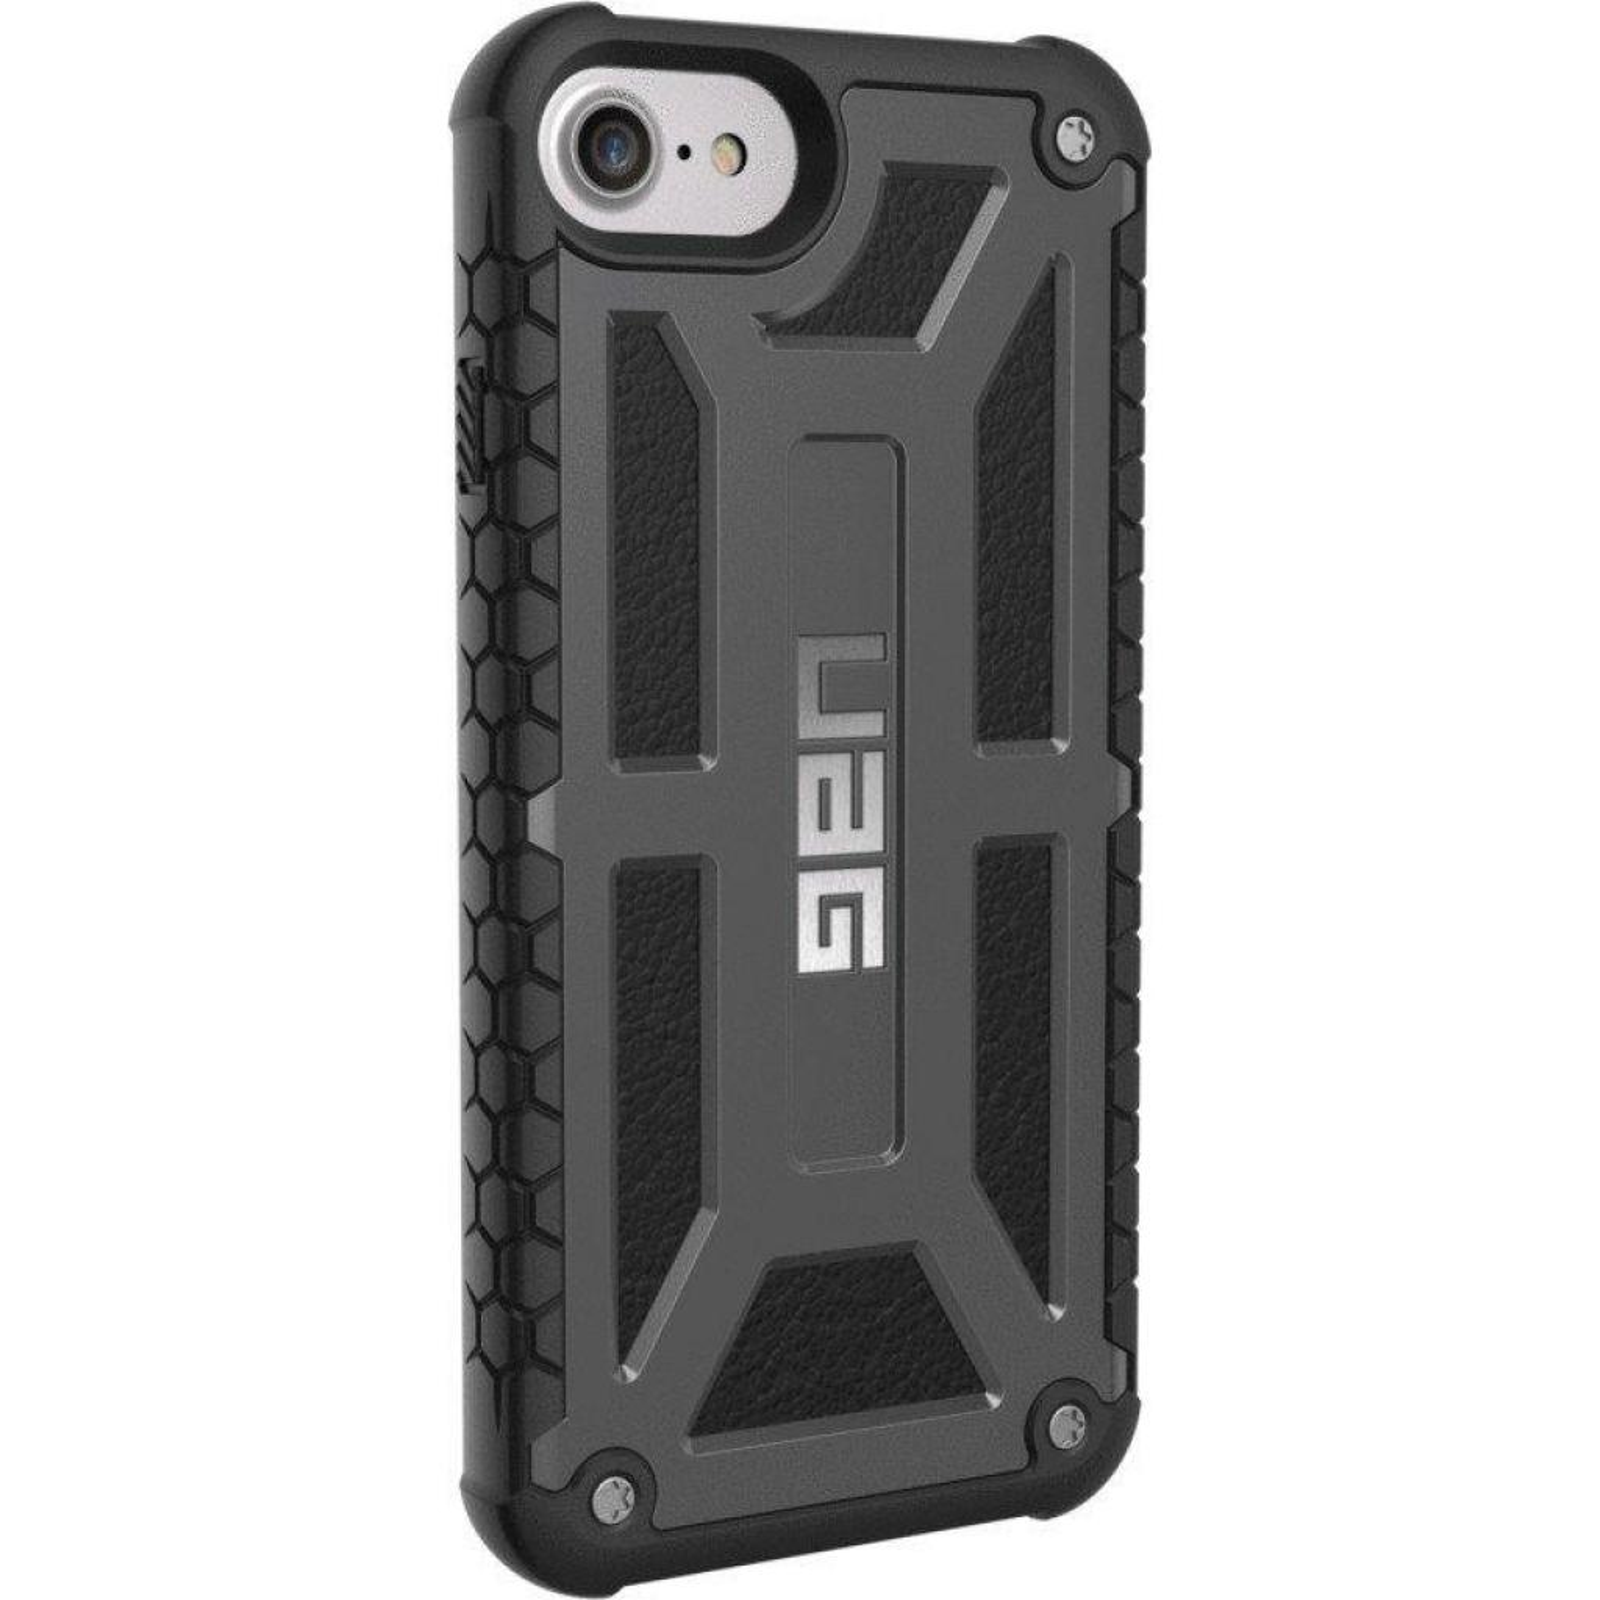 Чехол для моб. телефона Urban Armor Gear iPhone 8/7/6S/6 Monarch Graphite Black (IPH8/7-M-GR) изображение 3